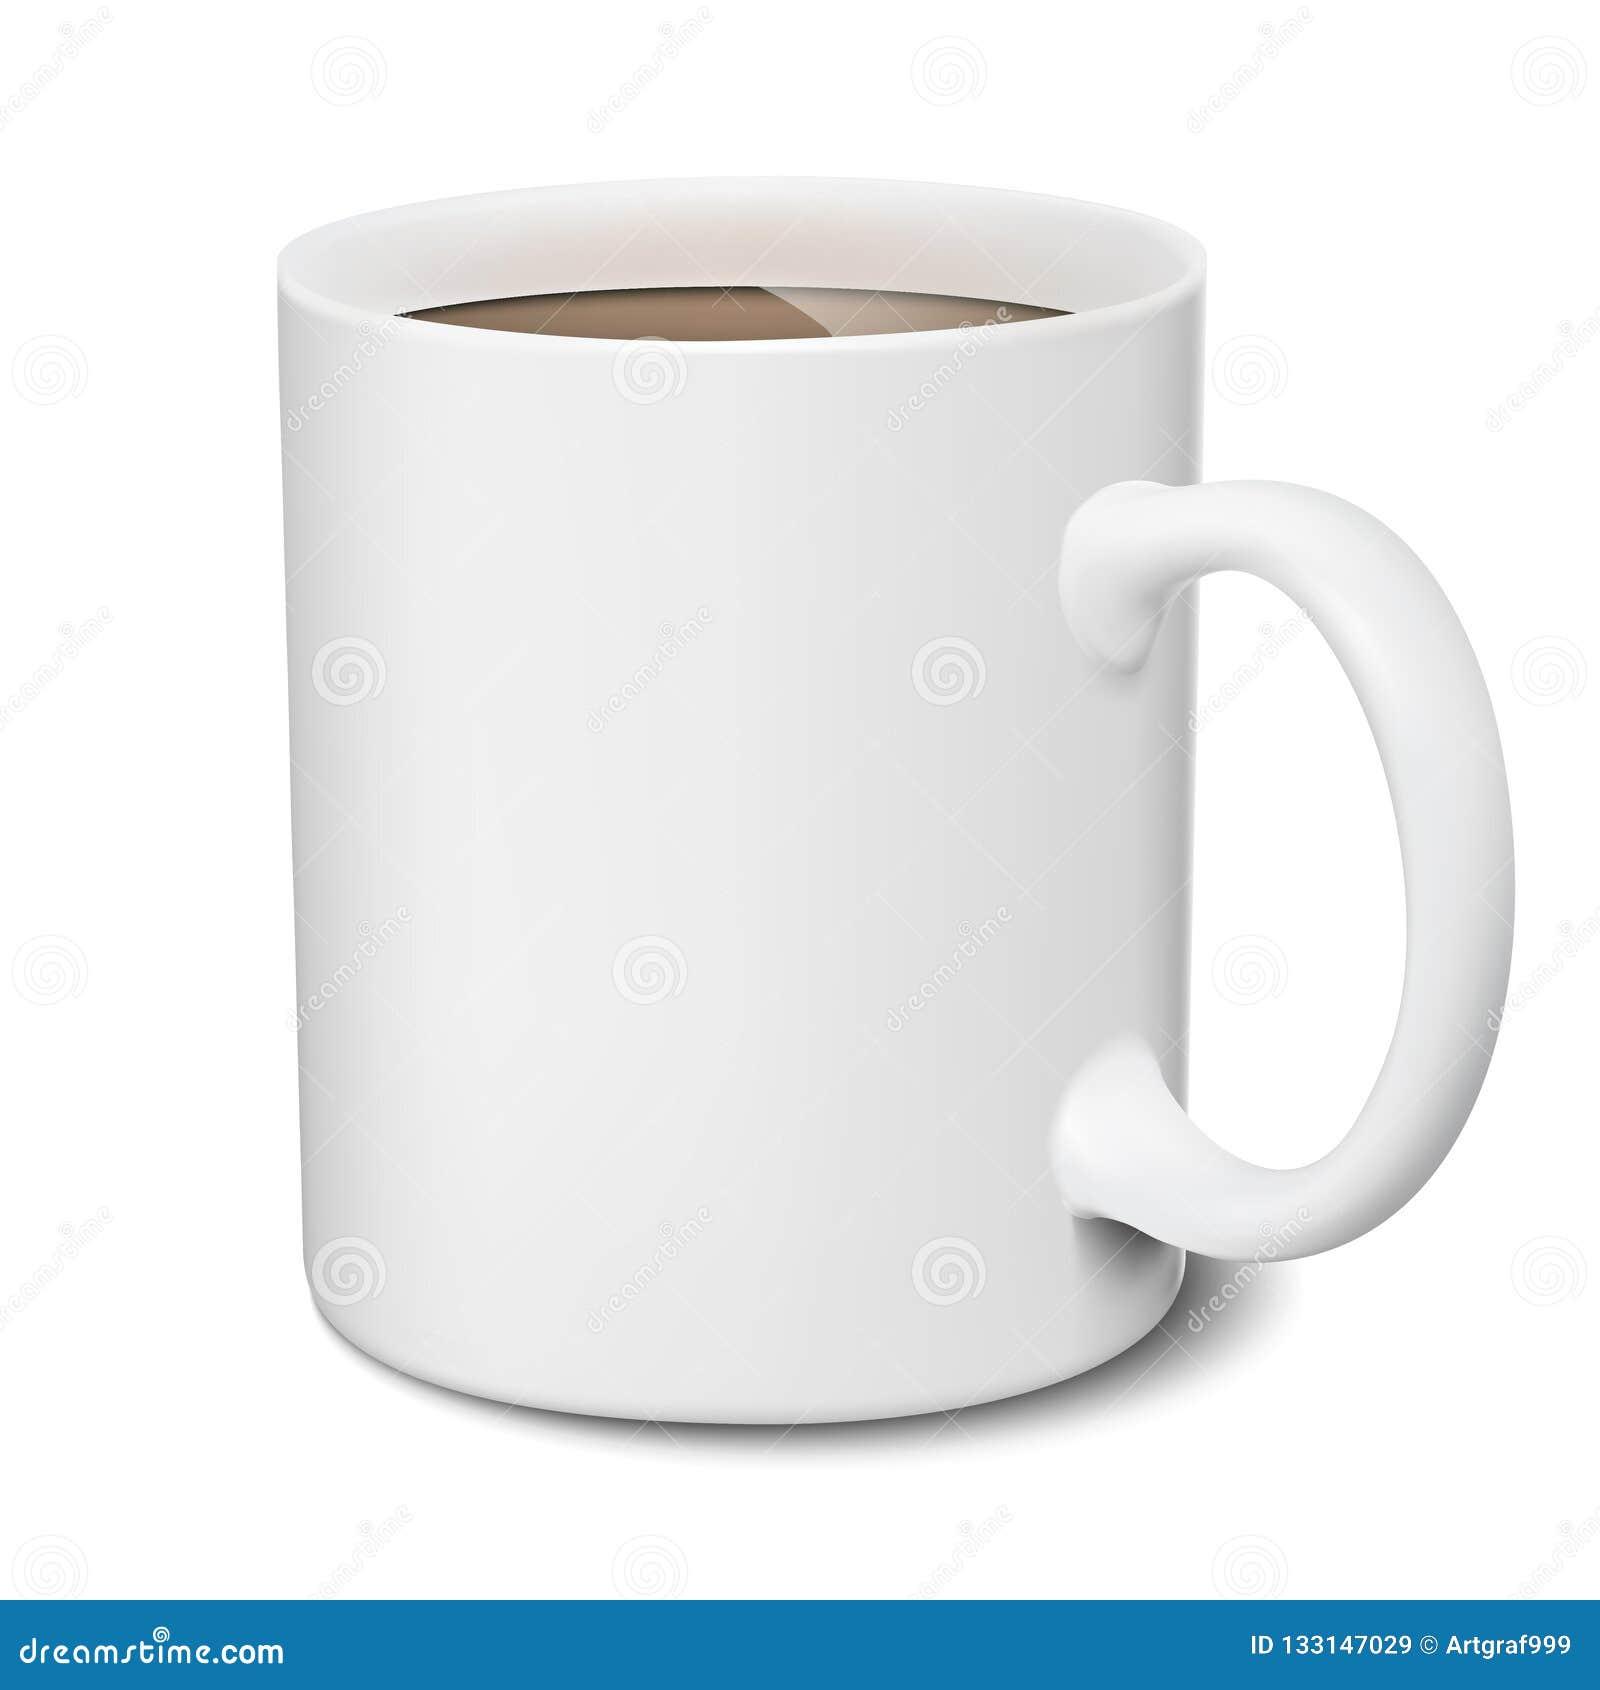 Mug Of Cocoa. White Mug Realistic Isolated 3D Mockup On